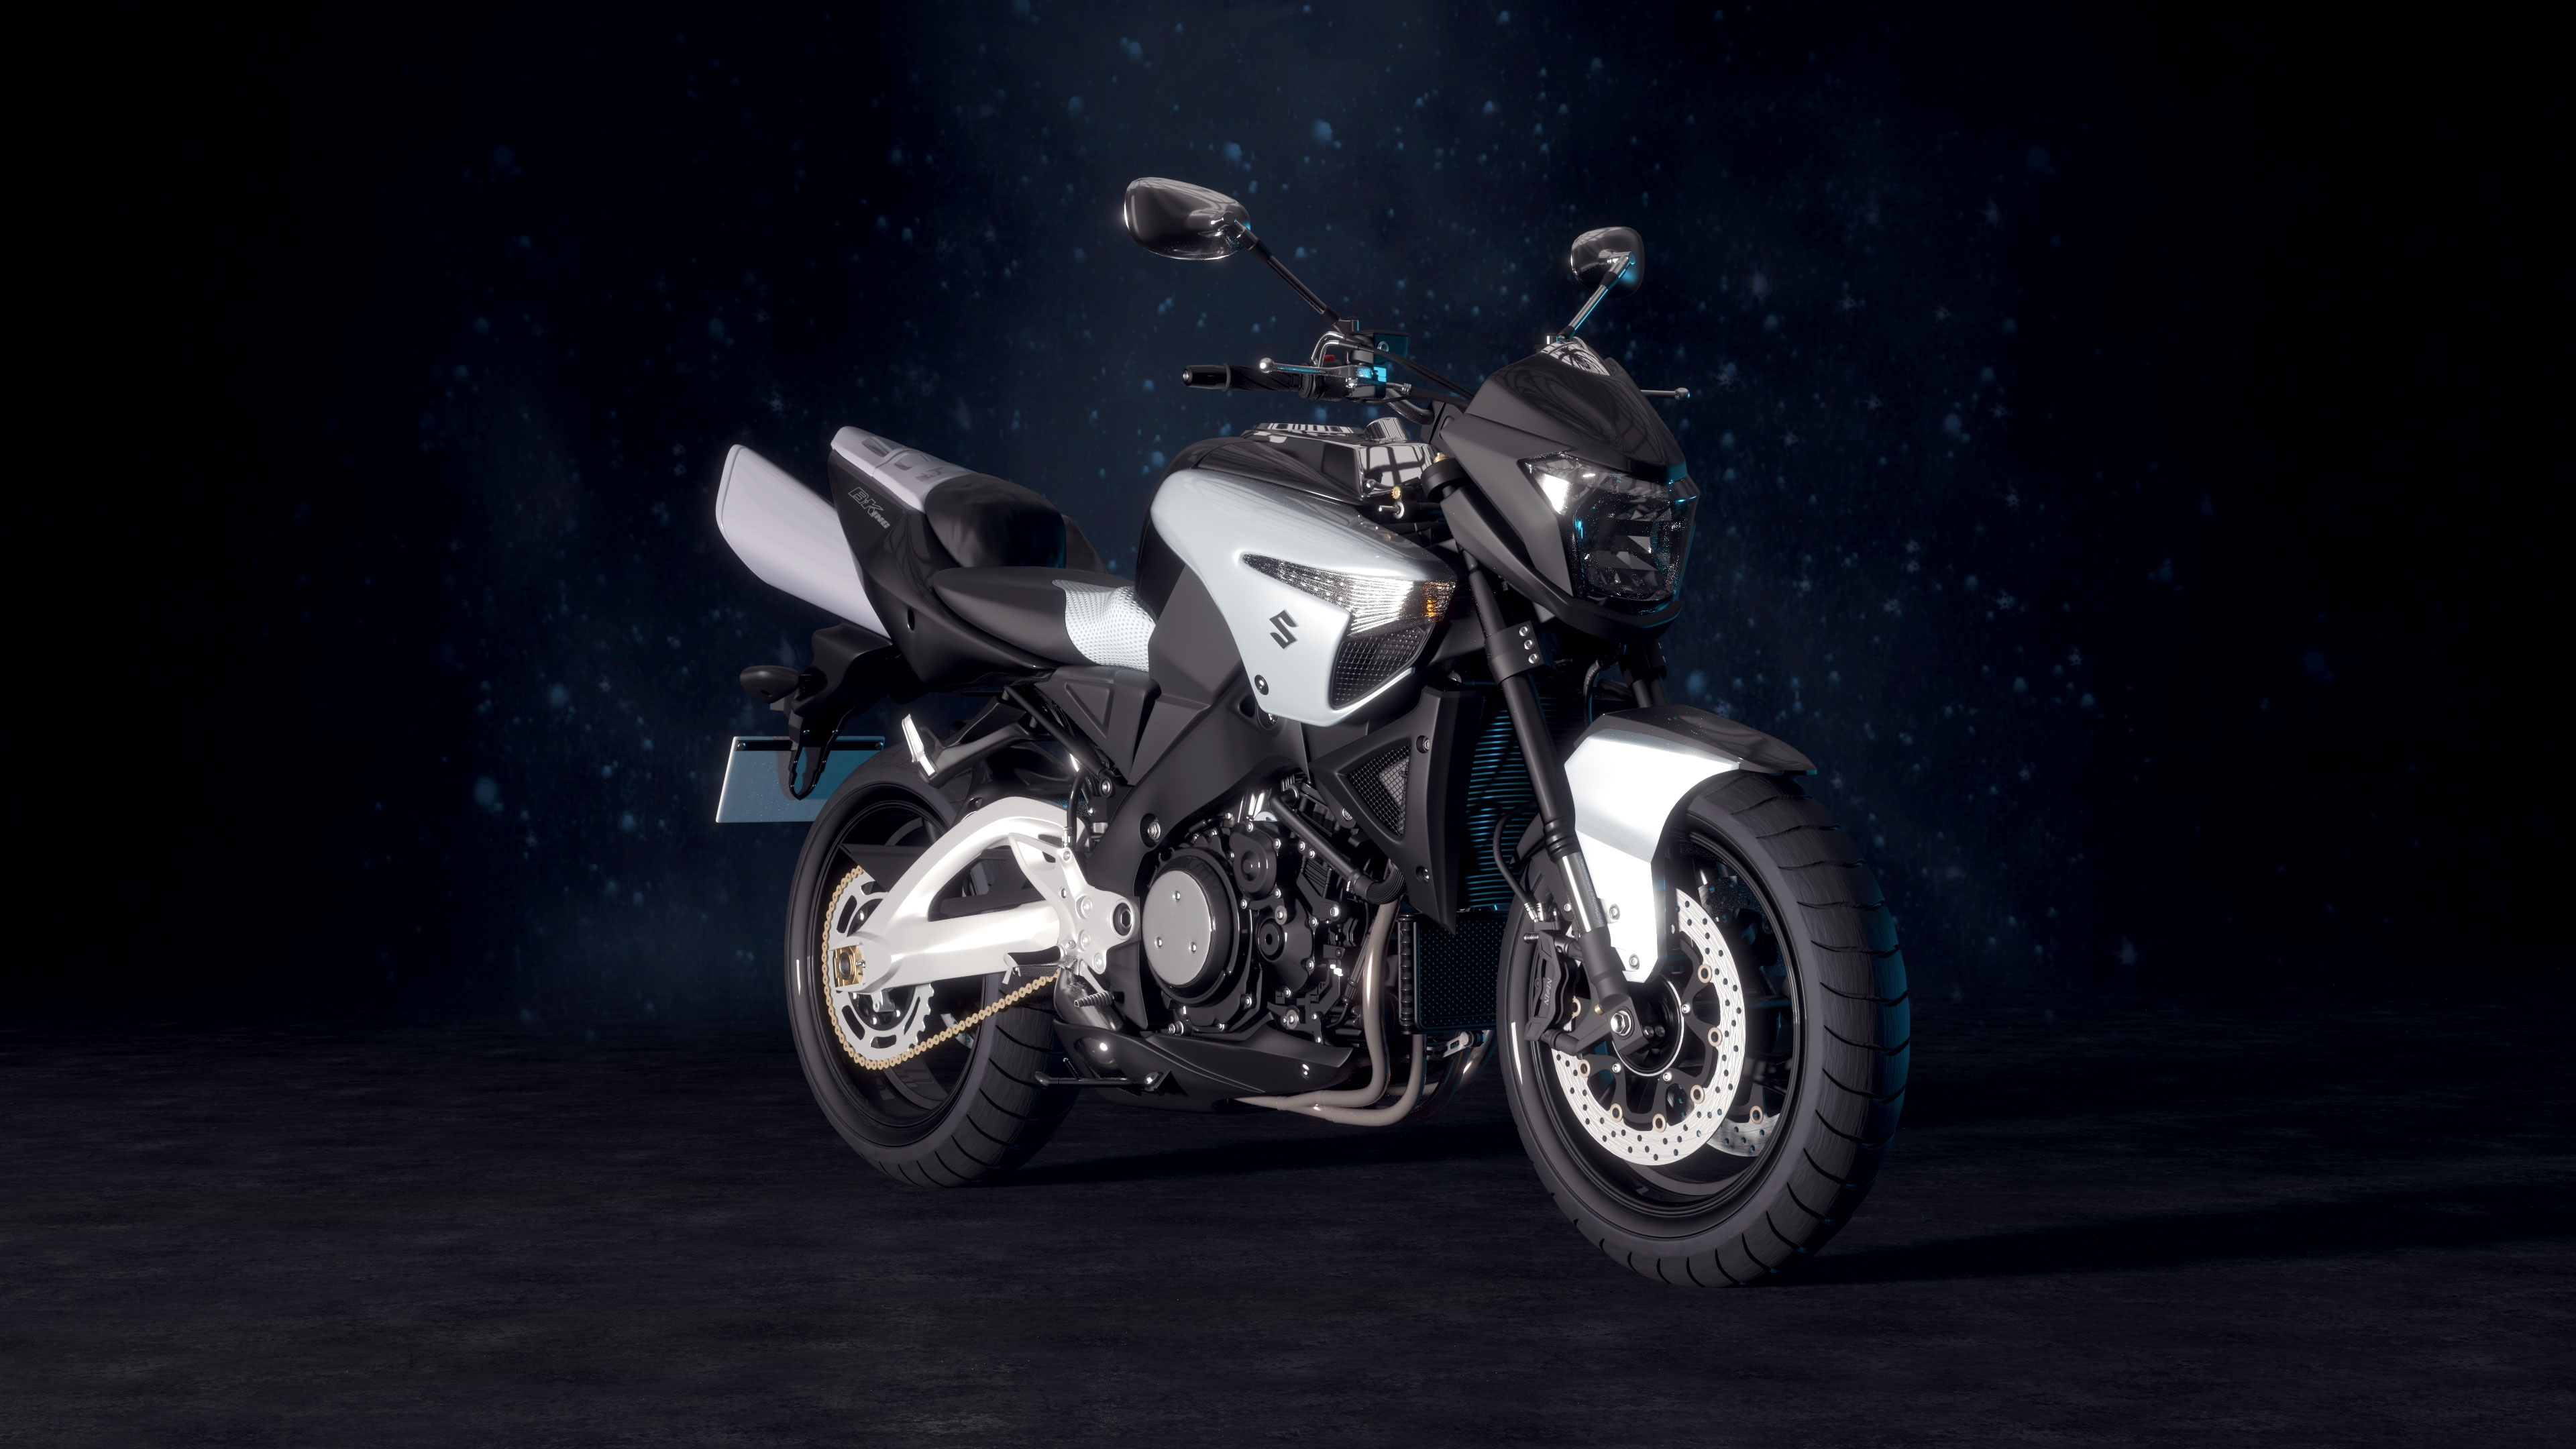 Suzuki Bike, Bike, Motor, Motorbike, Motorcycle, HQ Photo